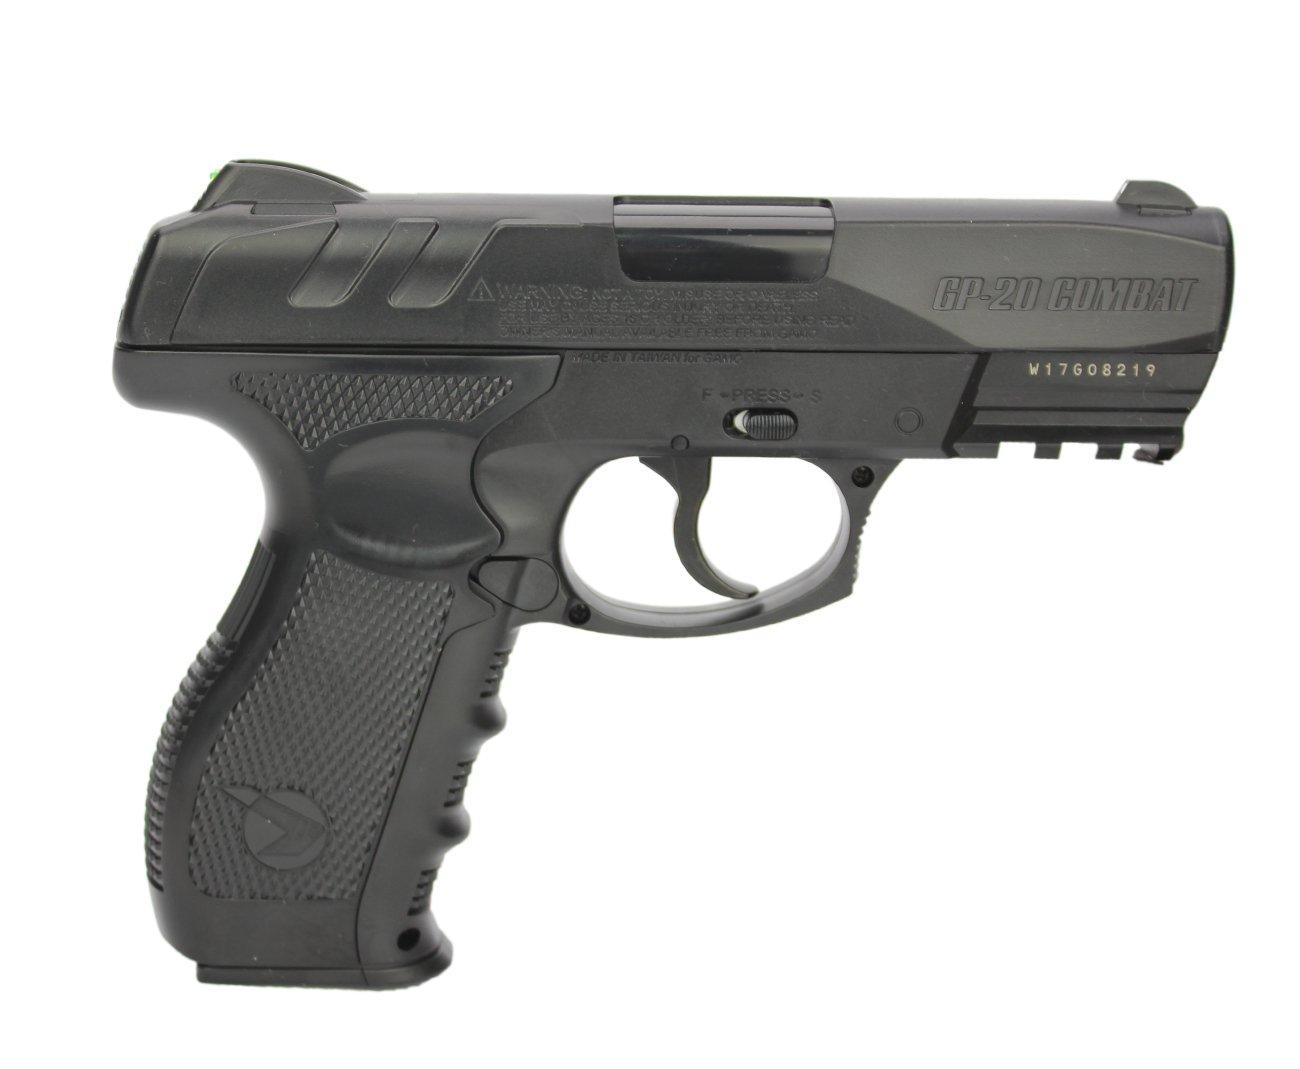 Pistola De Co2 Gamo Gp-20 Combat Cal 4,5mm